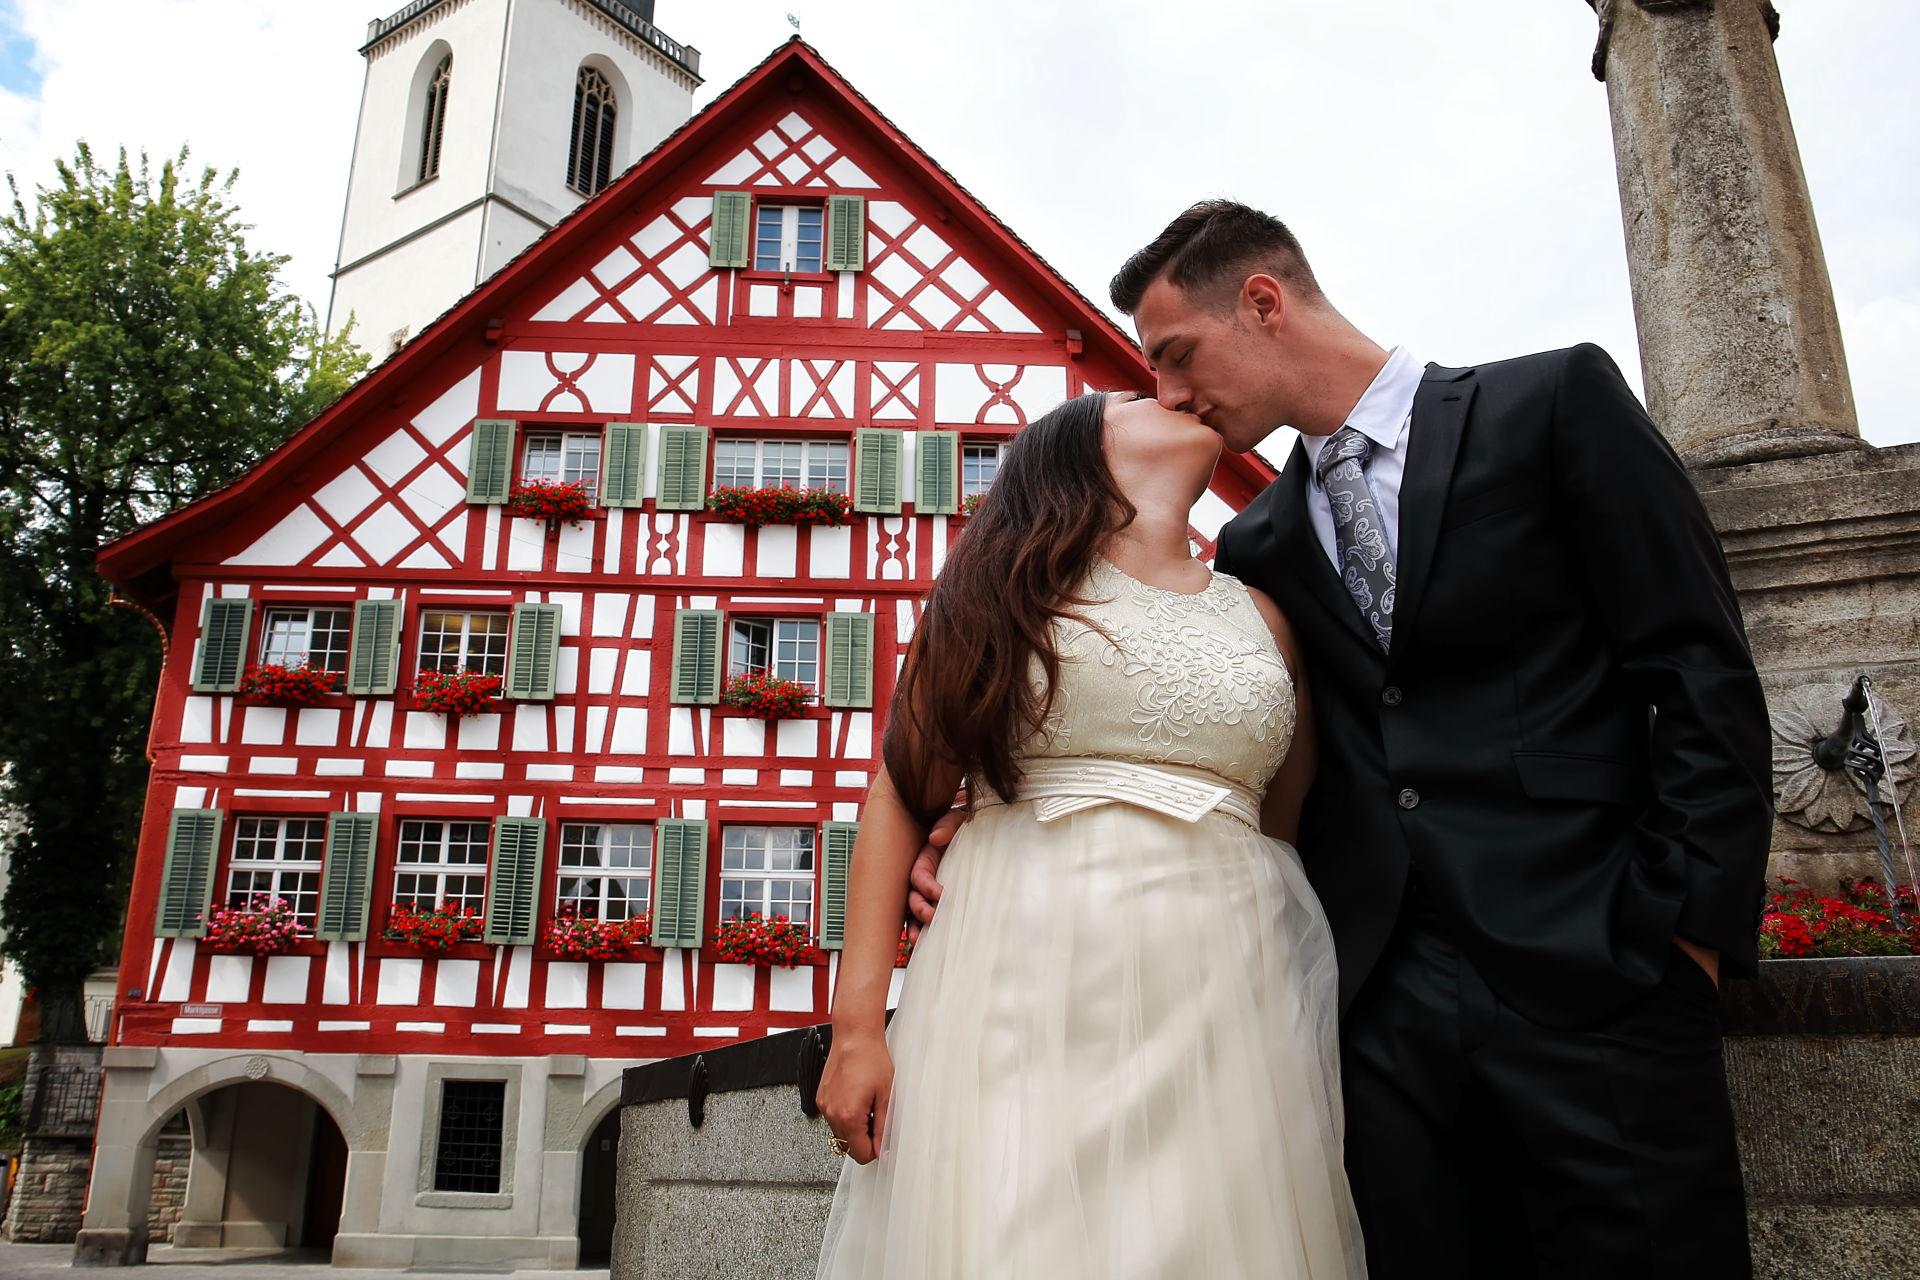 Fotografo matrimonio a Bülach, Zurigo, Svizzera, servizio fotografico nozze, wedding reportage photography,